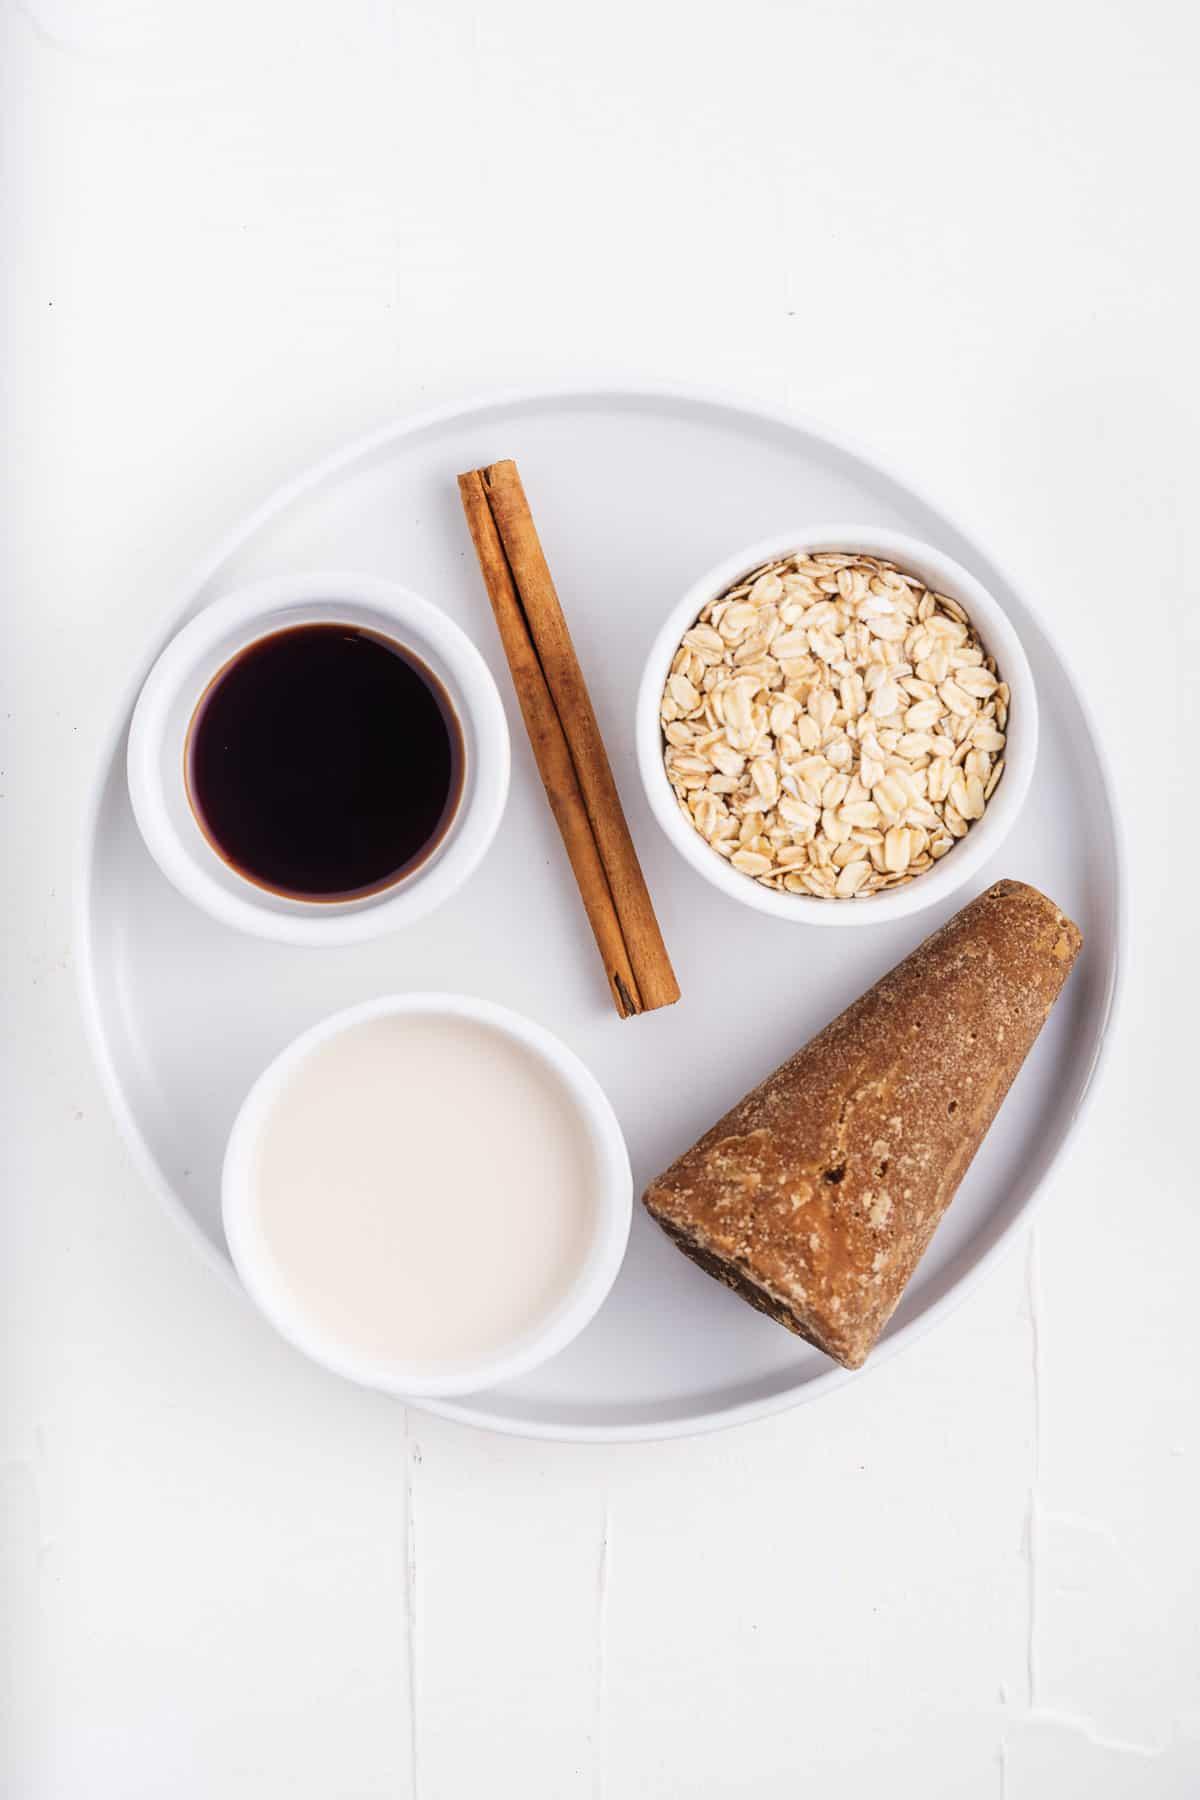 Piloncillo, Cinnamon Stick, Vanilla, Almond Milk, and Rolled Oats